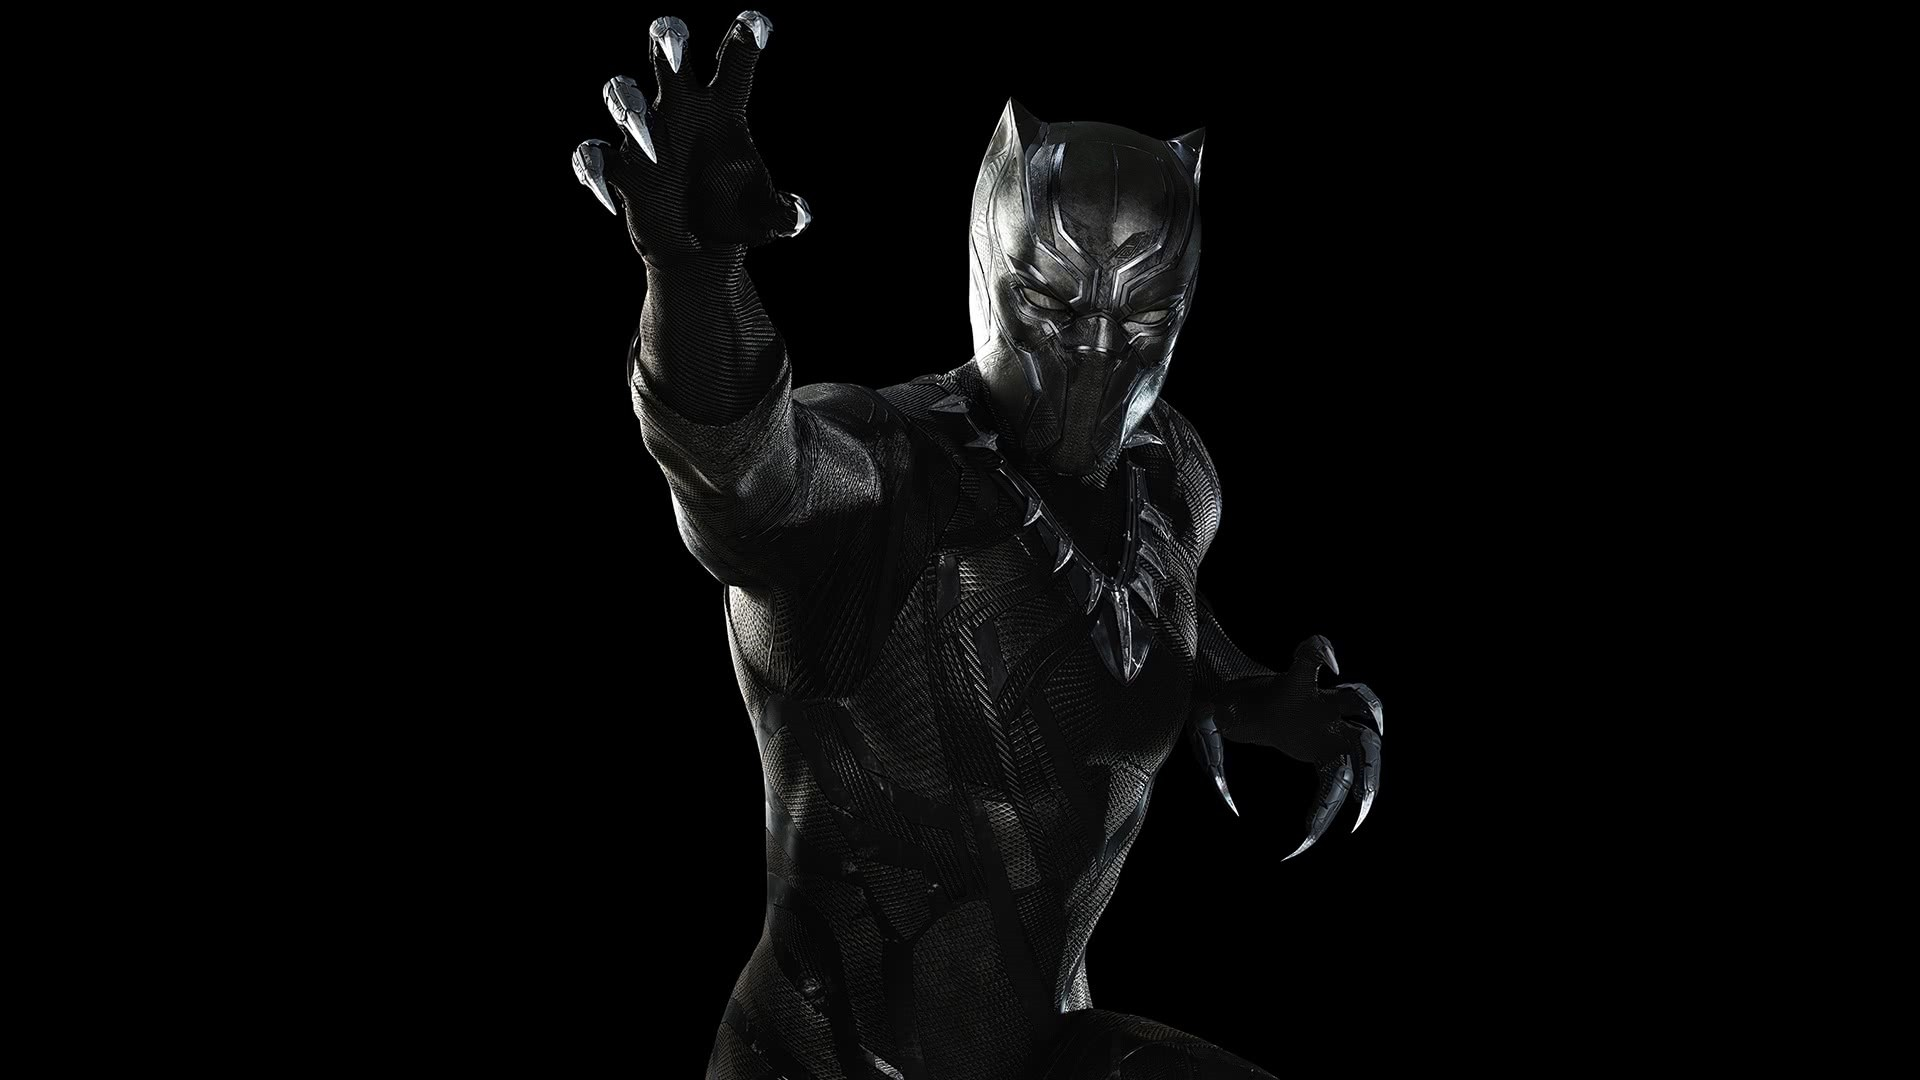 Black Panther Wallpaper theme